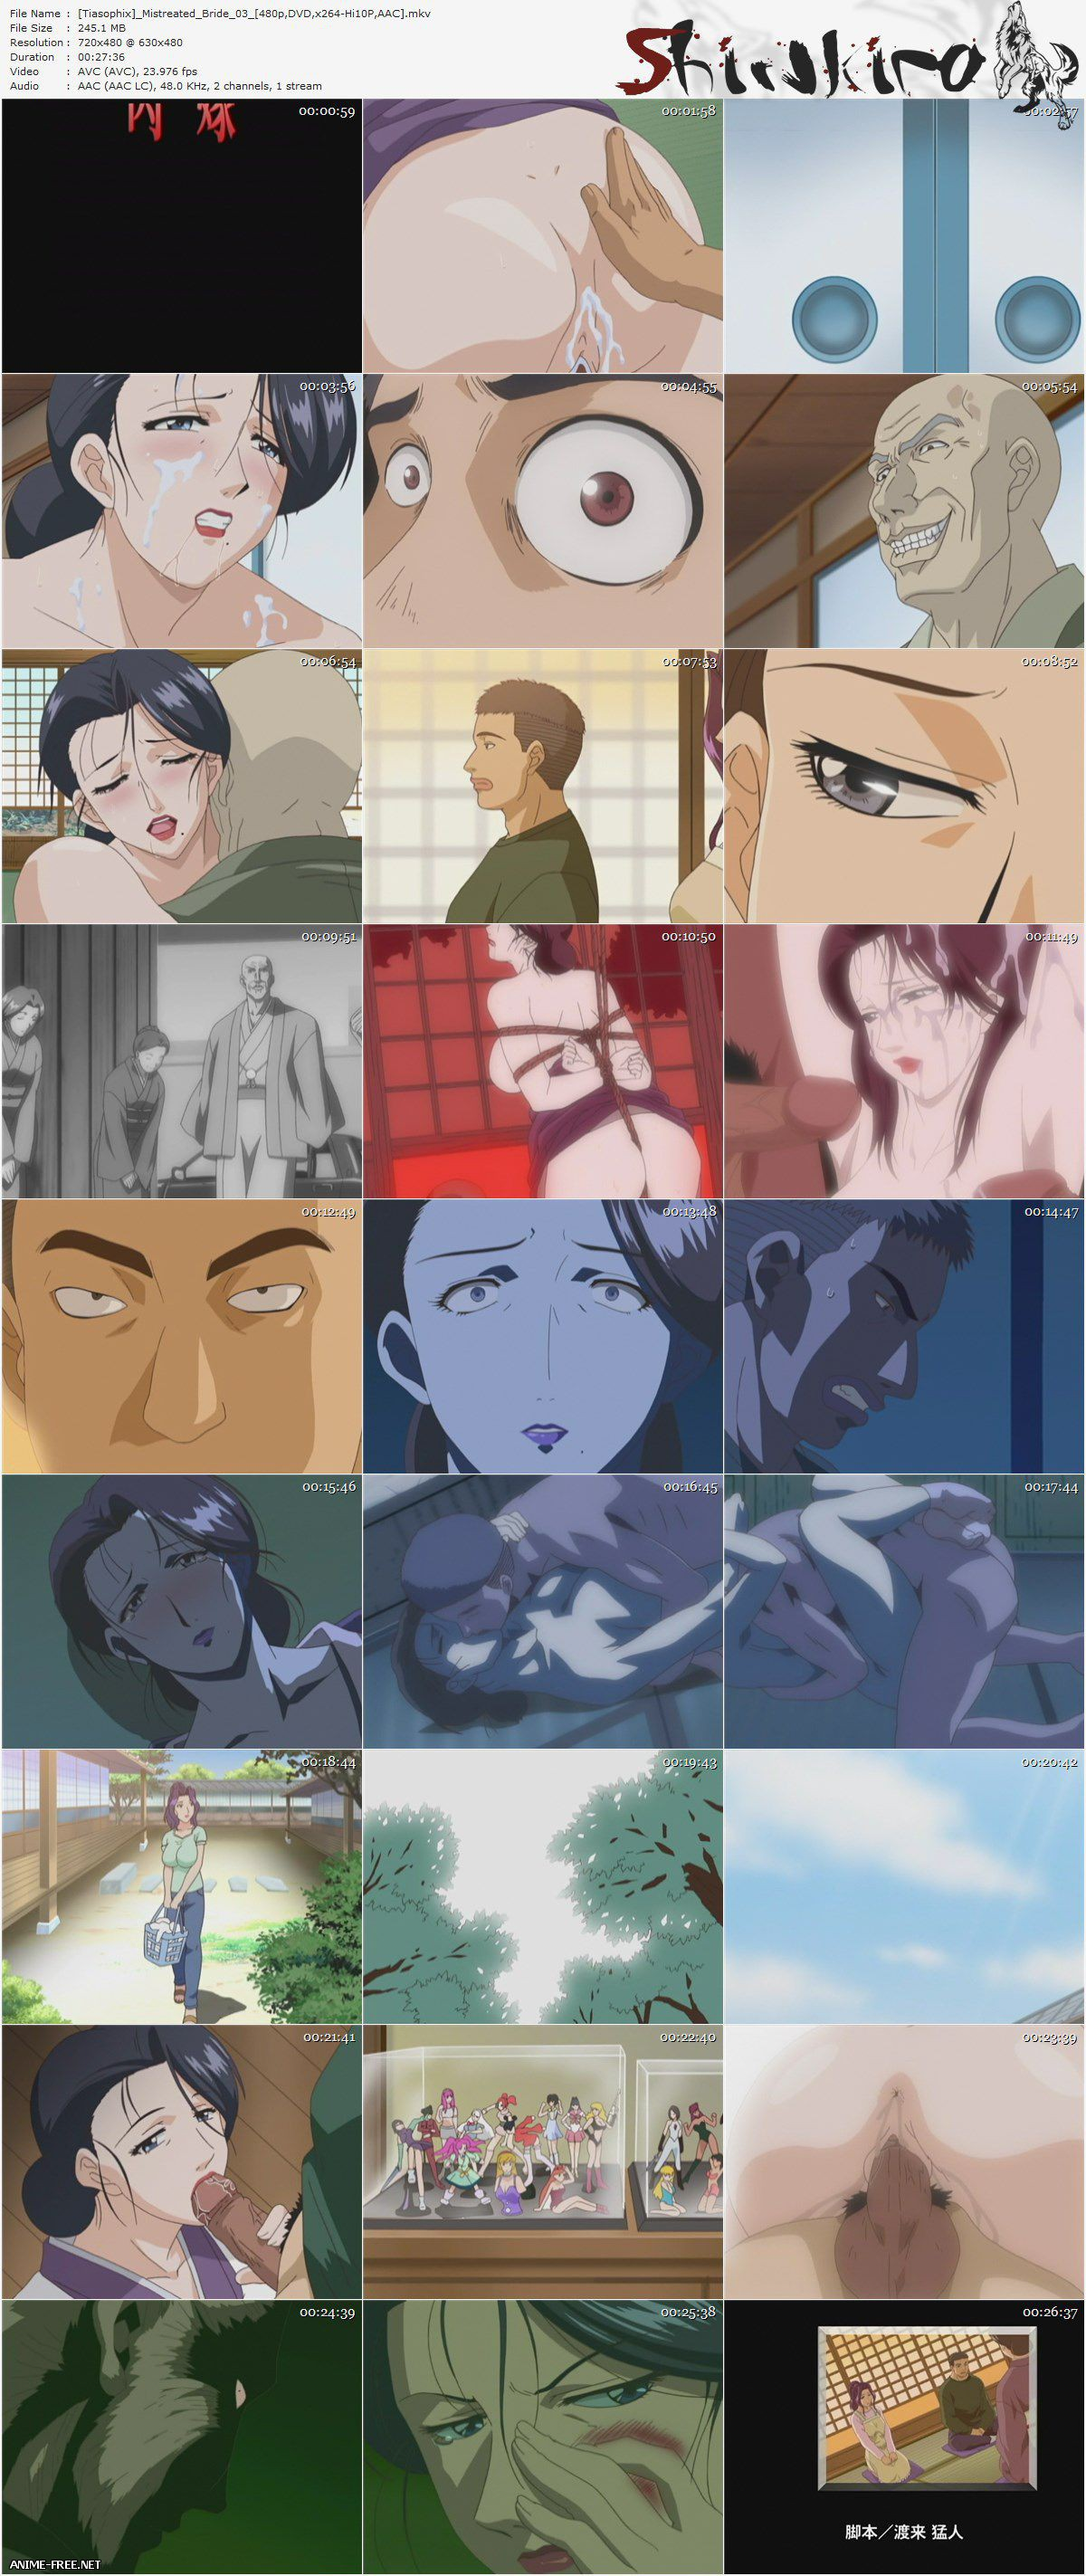 Mistreated Bride / Nikuyome: Takayanagi Ke no Hitobito / �������, � ������� ����� ���������� [4 �� 4] [JPN,ENG,RUS] Anime Hentai